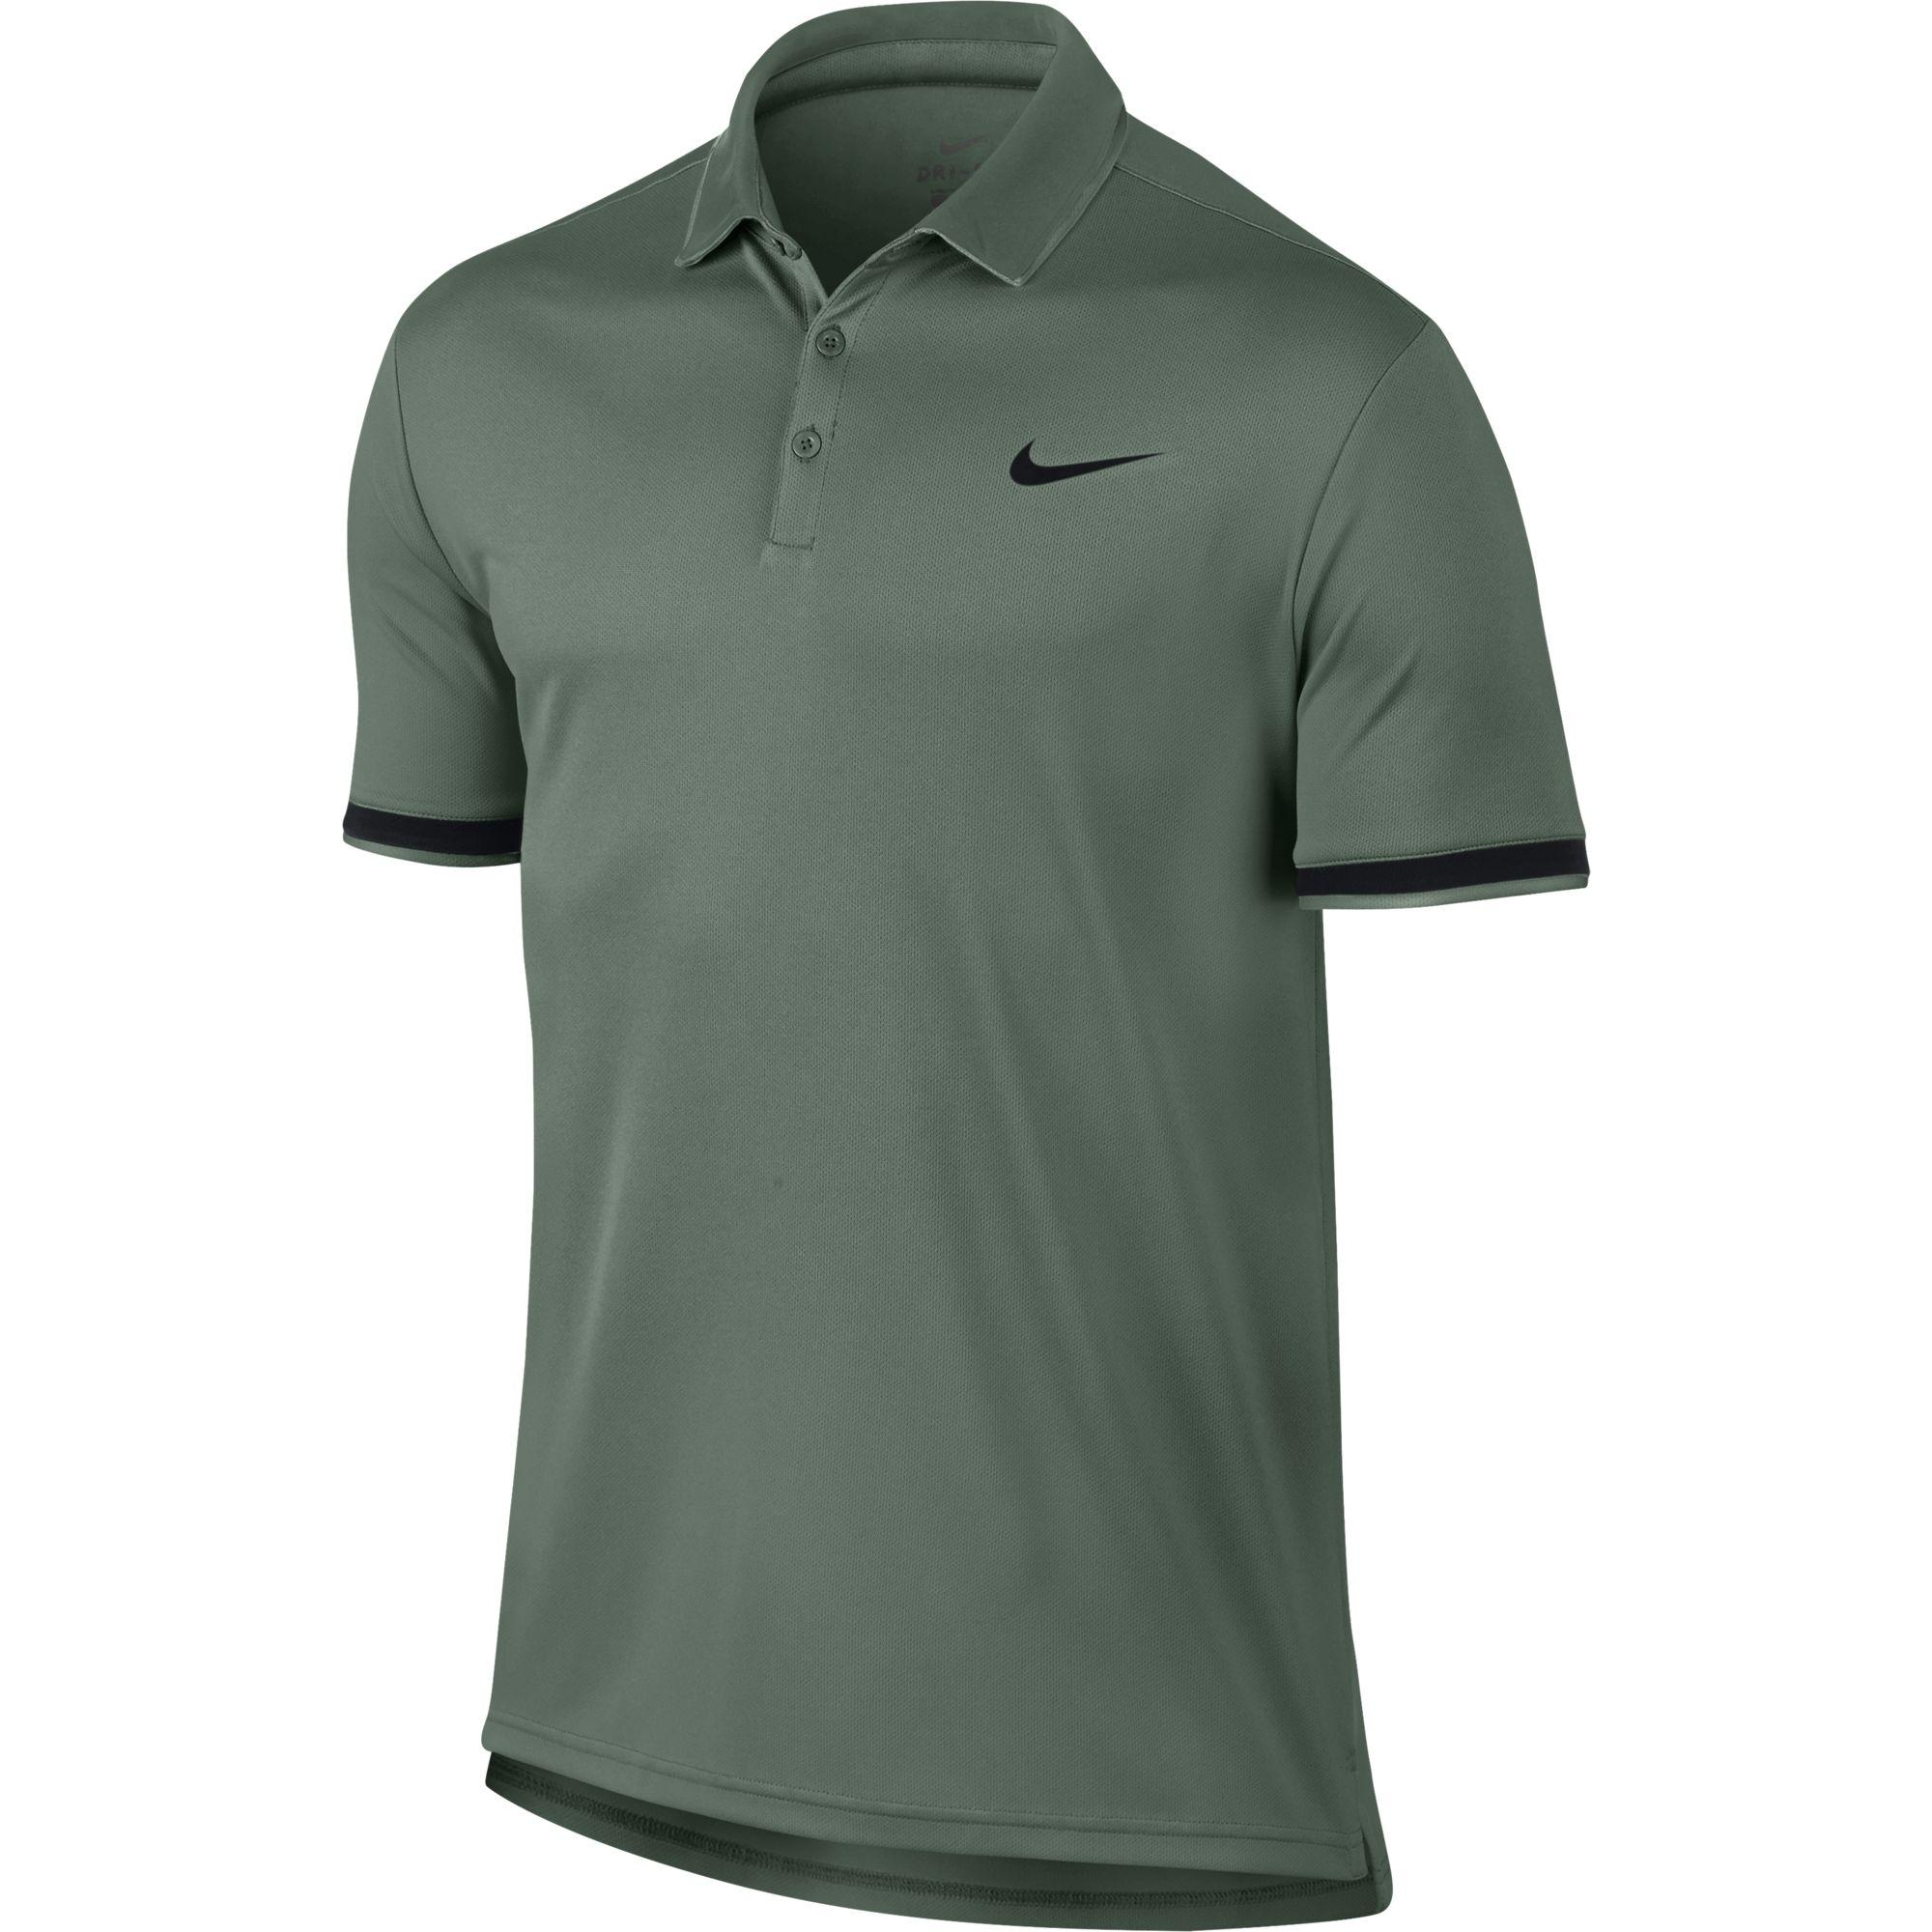 c5af06c9 Nike Mens Dry Tennis Polo - Clay Green/Black - Tennisnuts.com